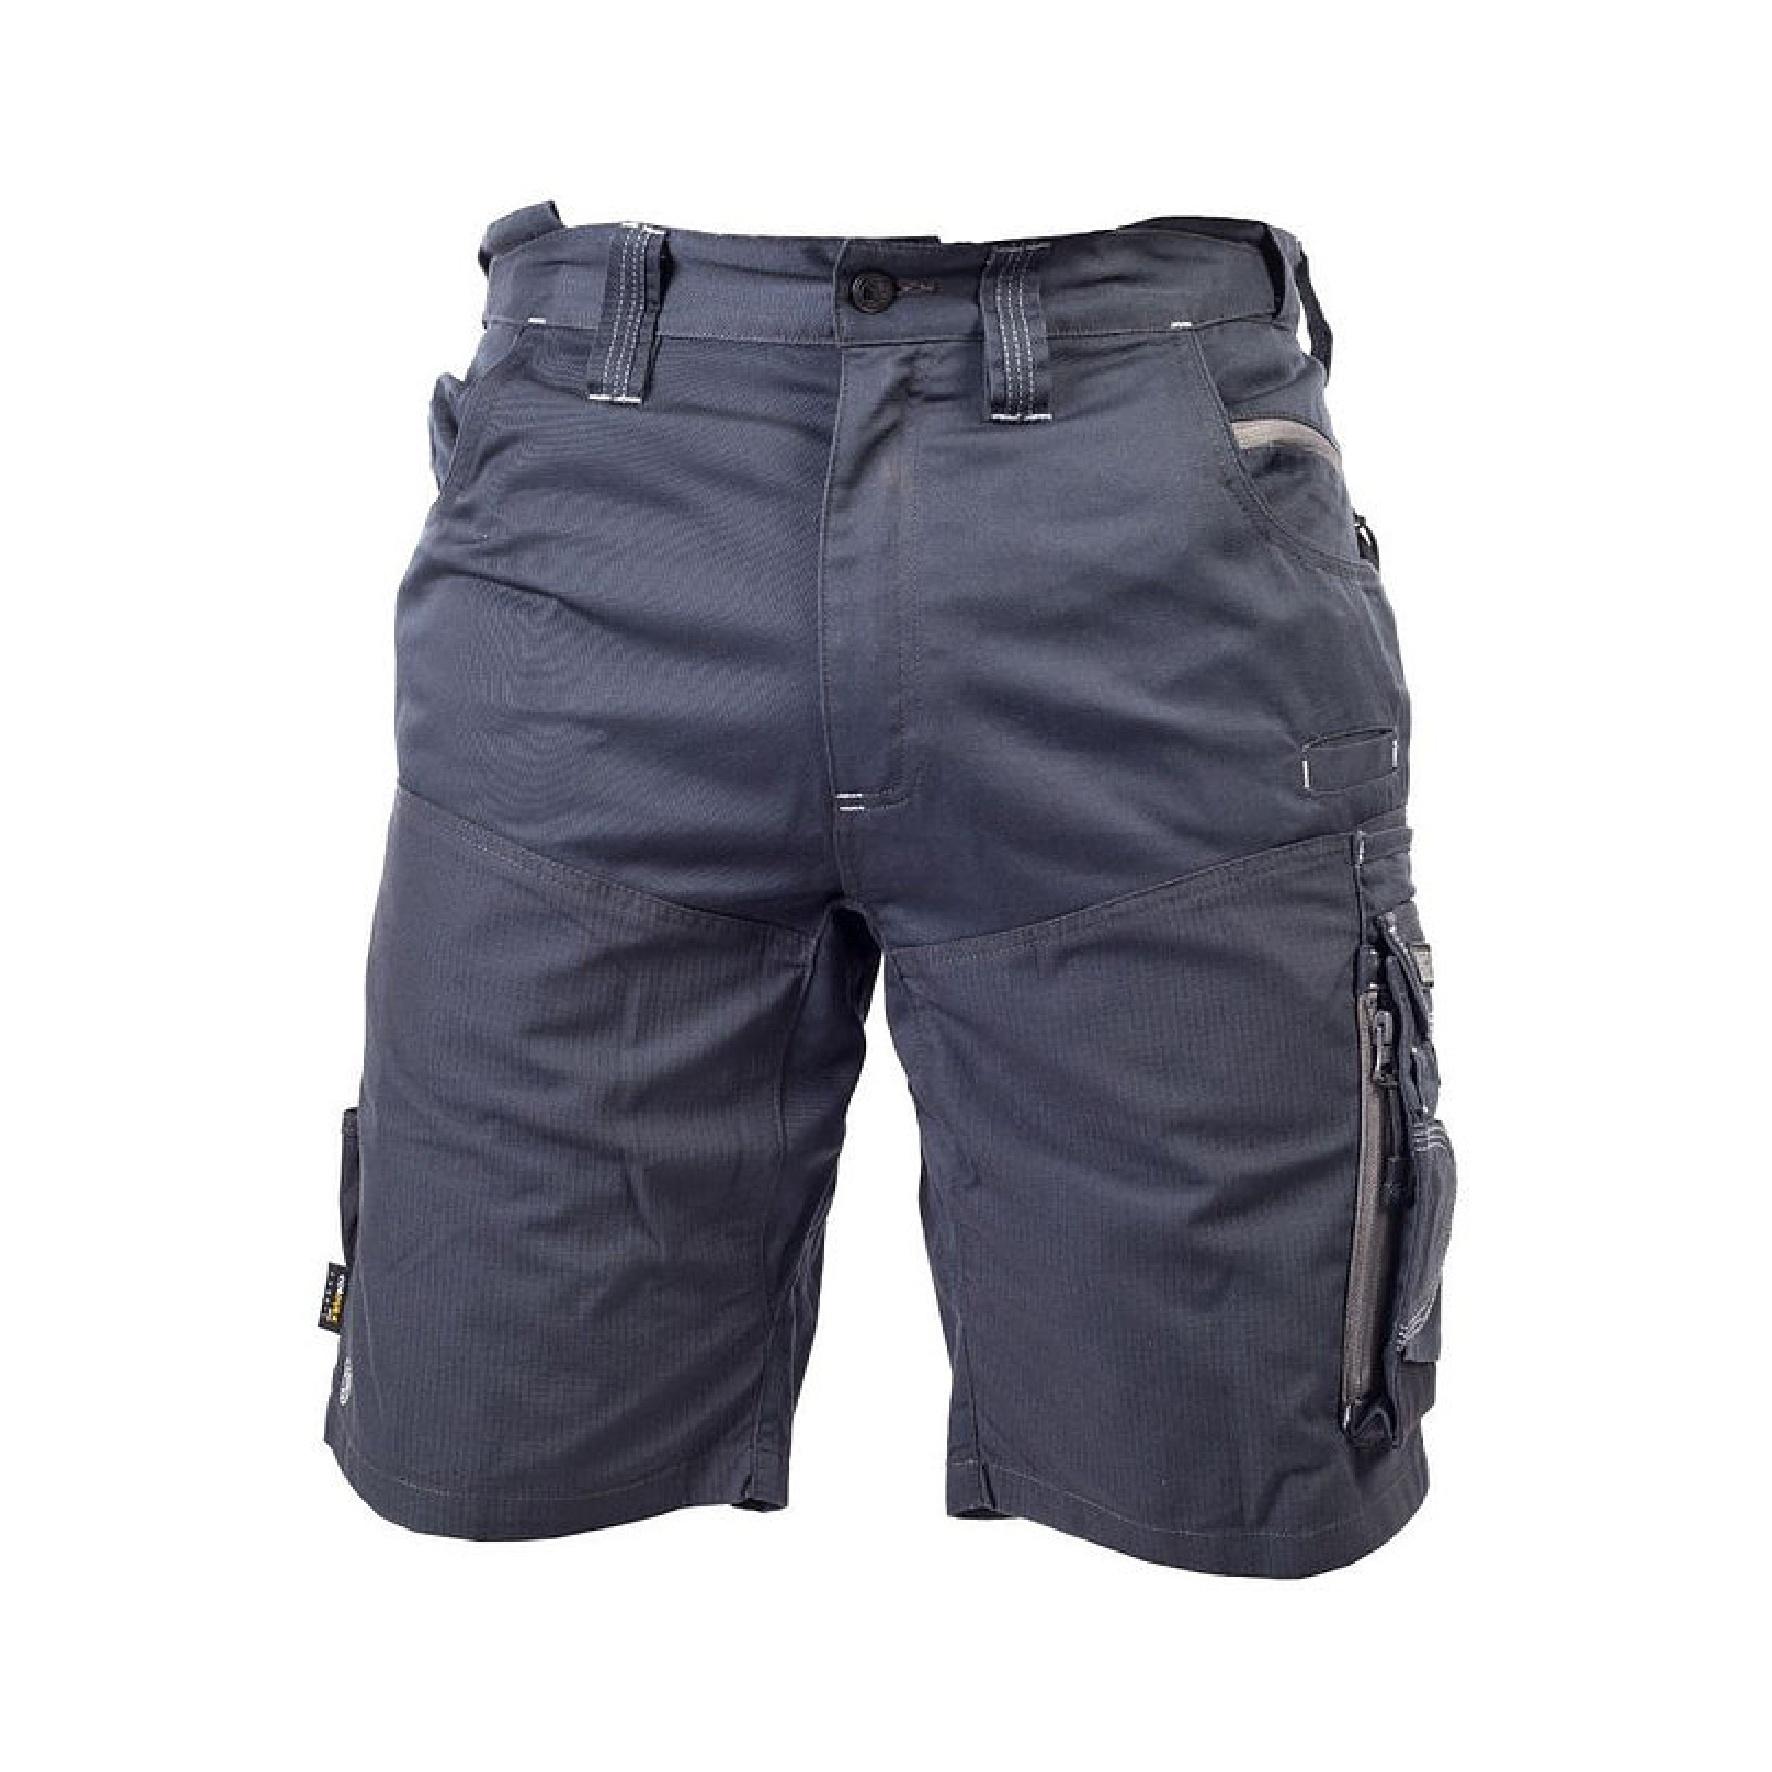 Redrok Workwear Centre Plymouth Apache ATS Cargo Shorts